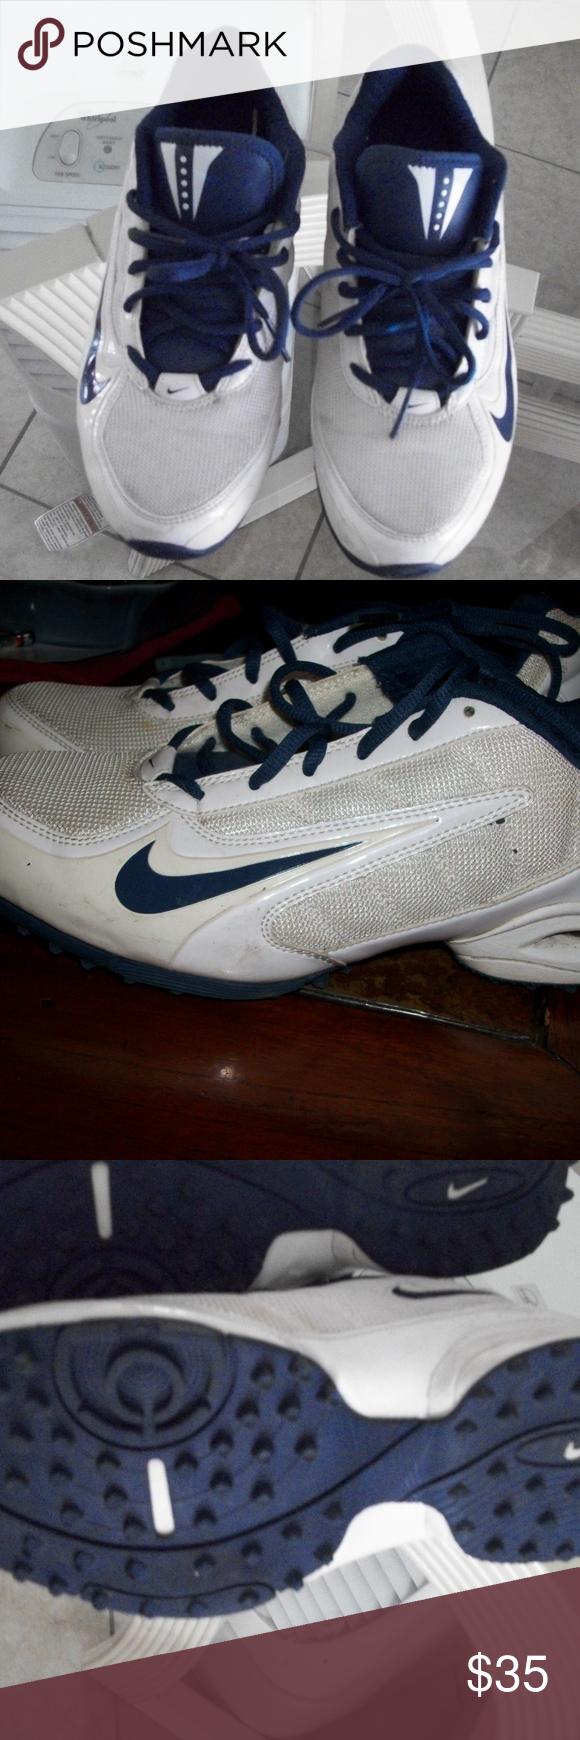 Nike LaCrosse tennis shoes in 2020